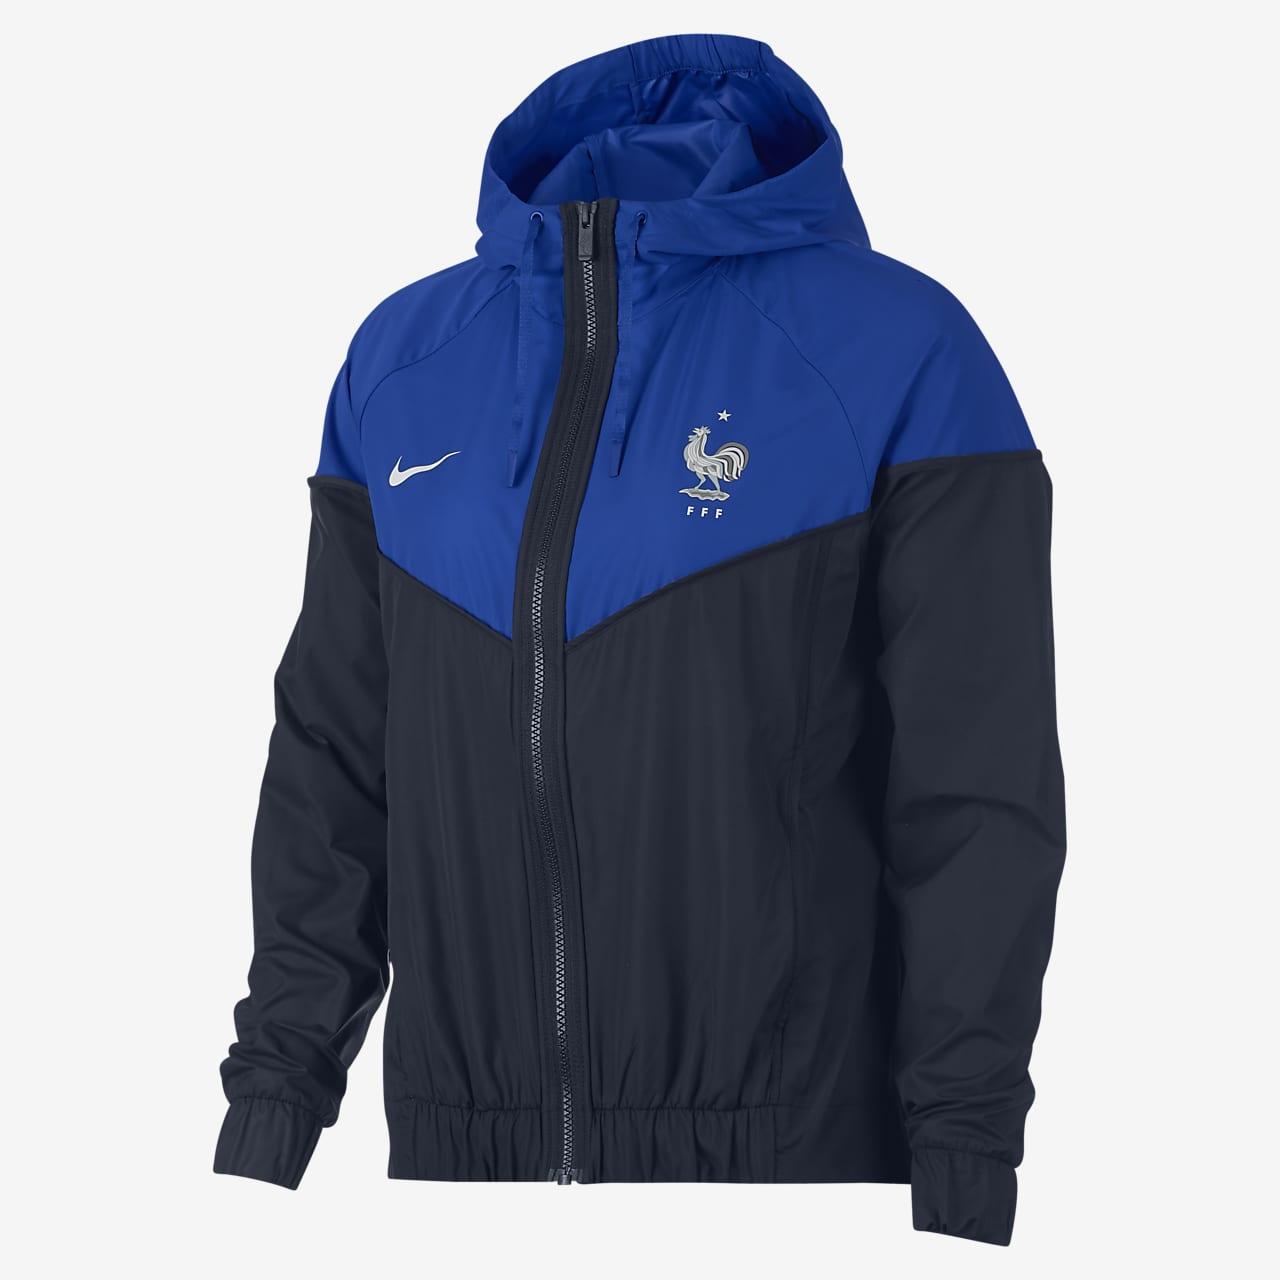 FFF Authentic Windrunner Women's Jacket